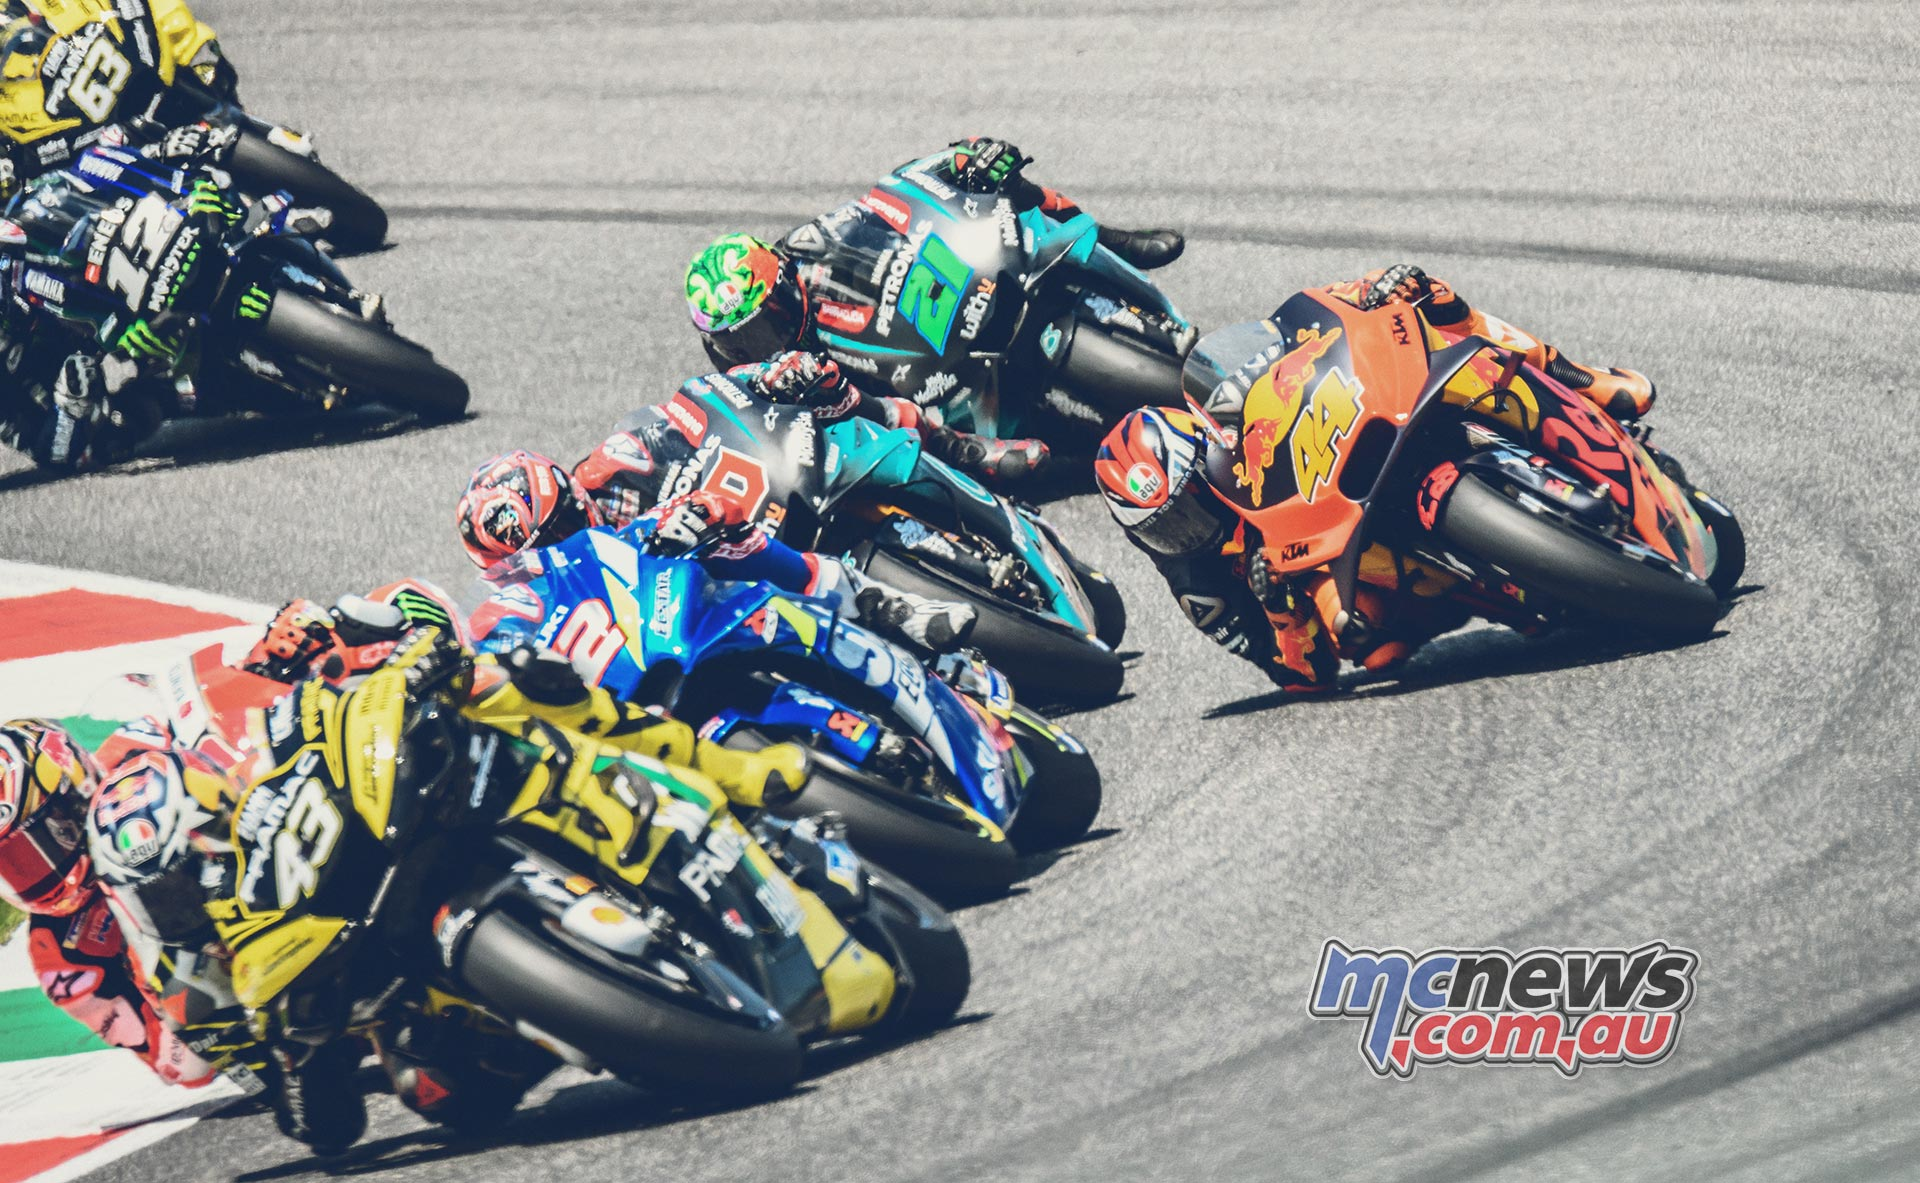 MotoGP Rnd Mugello Race Miller Rins Quarataro Pol Espargaro